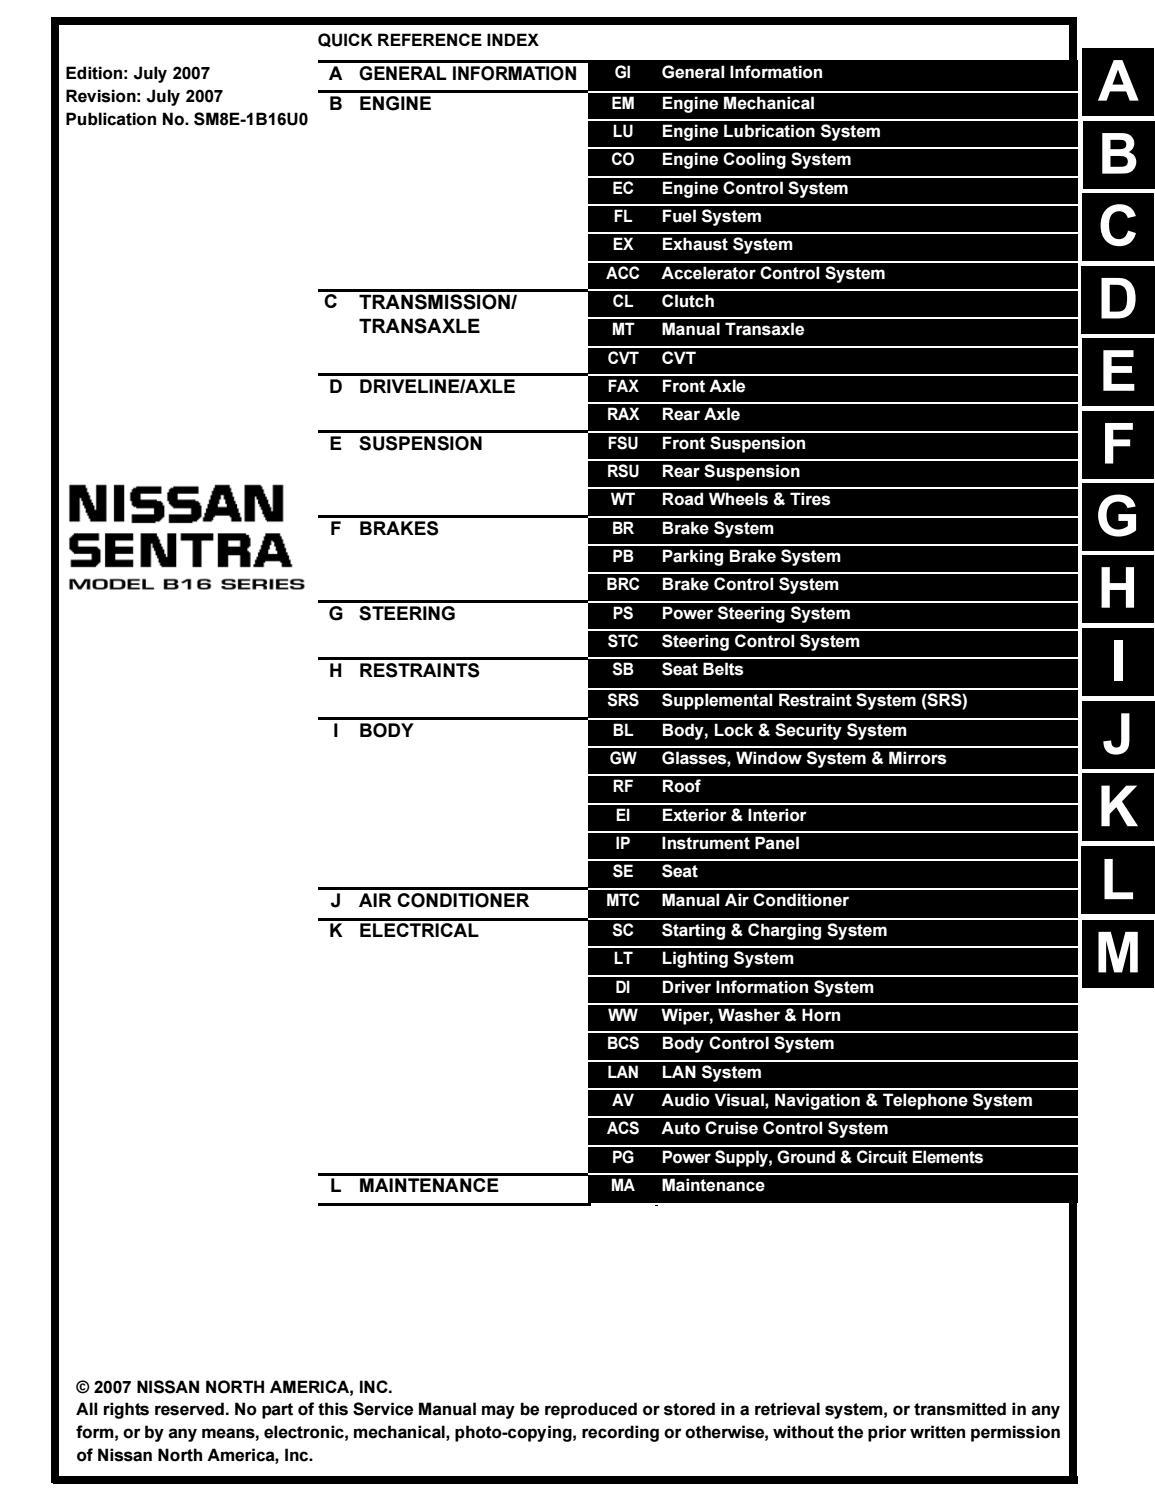 Nissan Sentra Service Manual: On Board Diagnostic (OBD) System of Engine and CVT